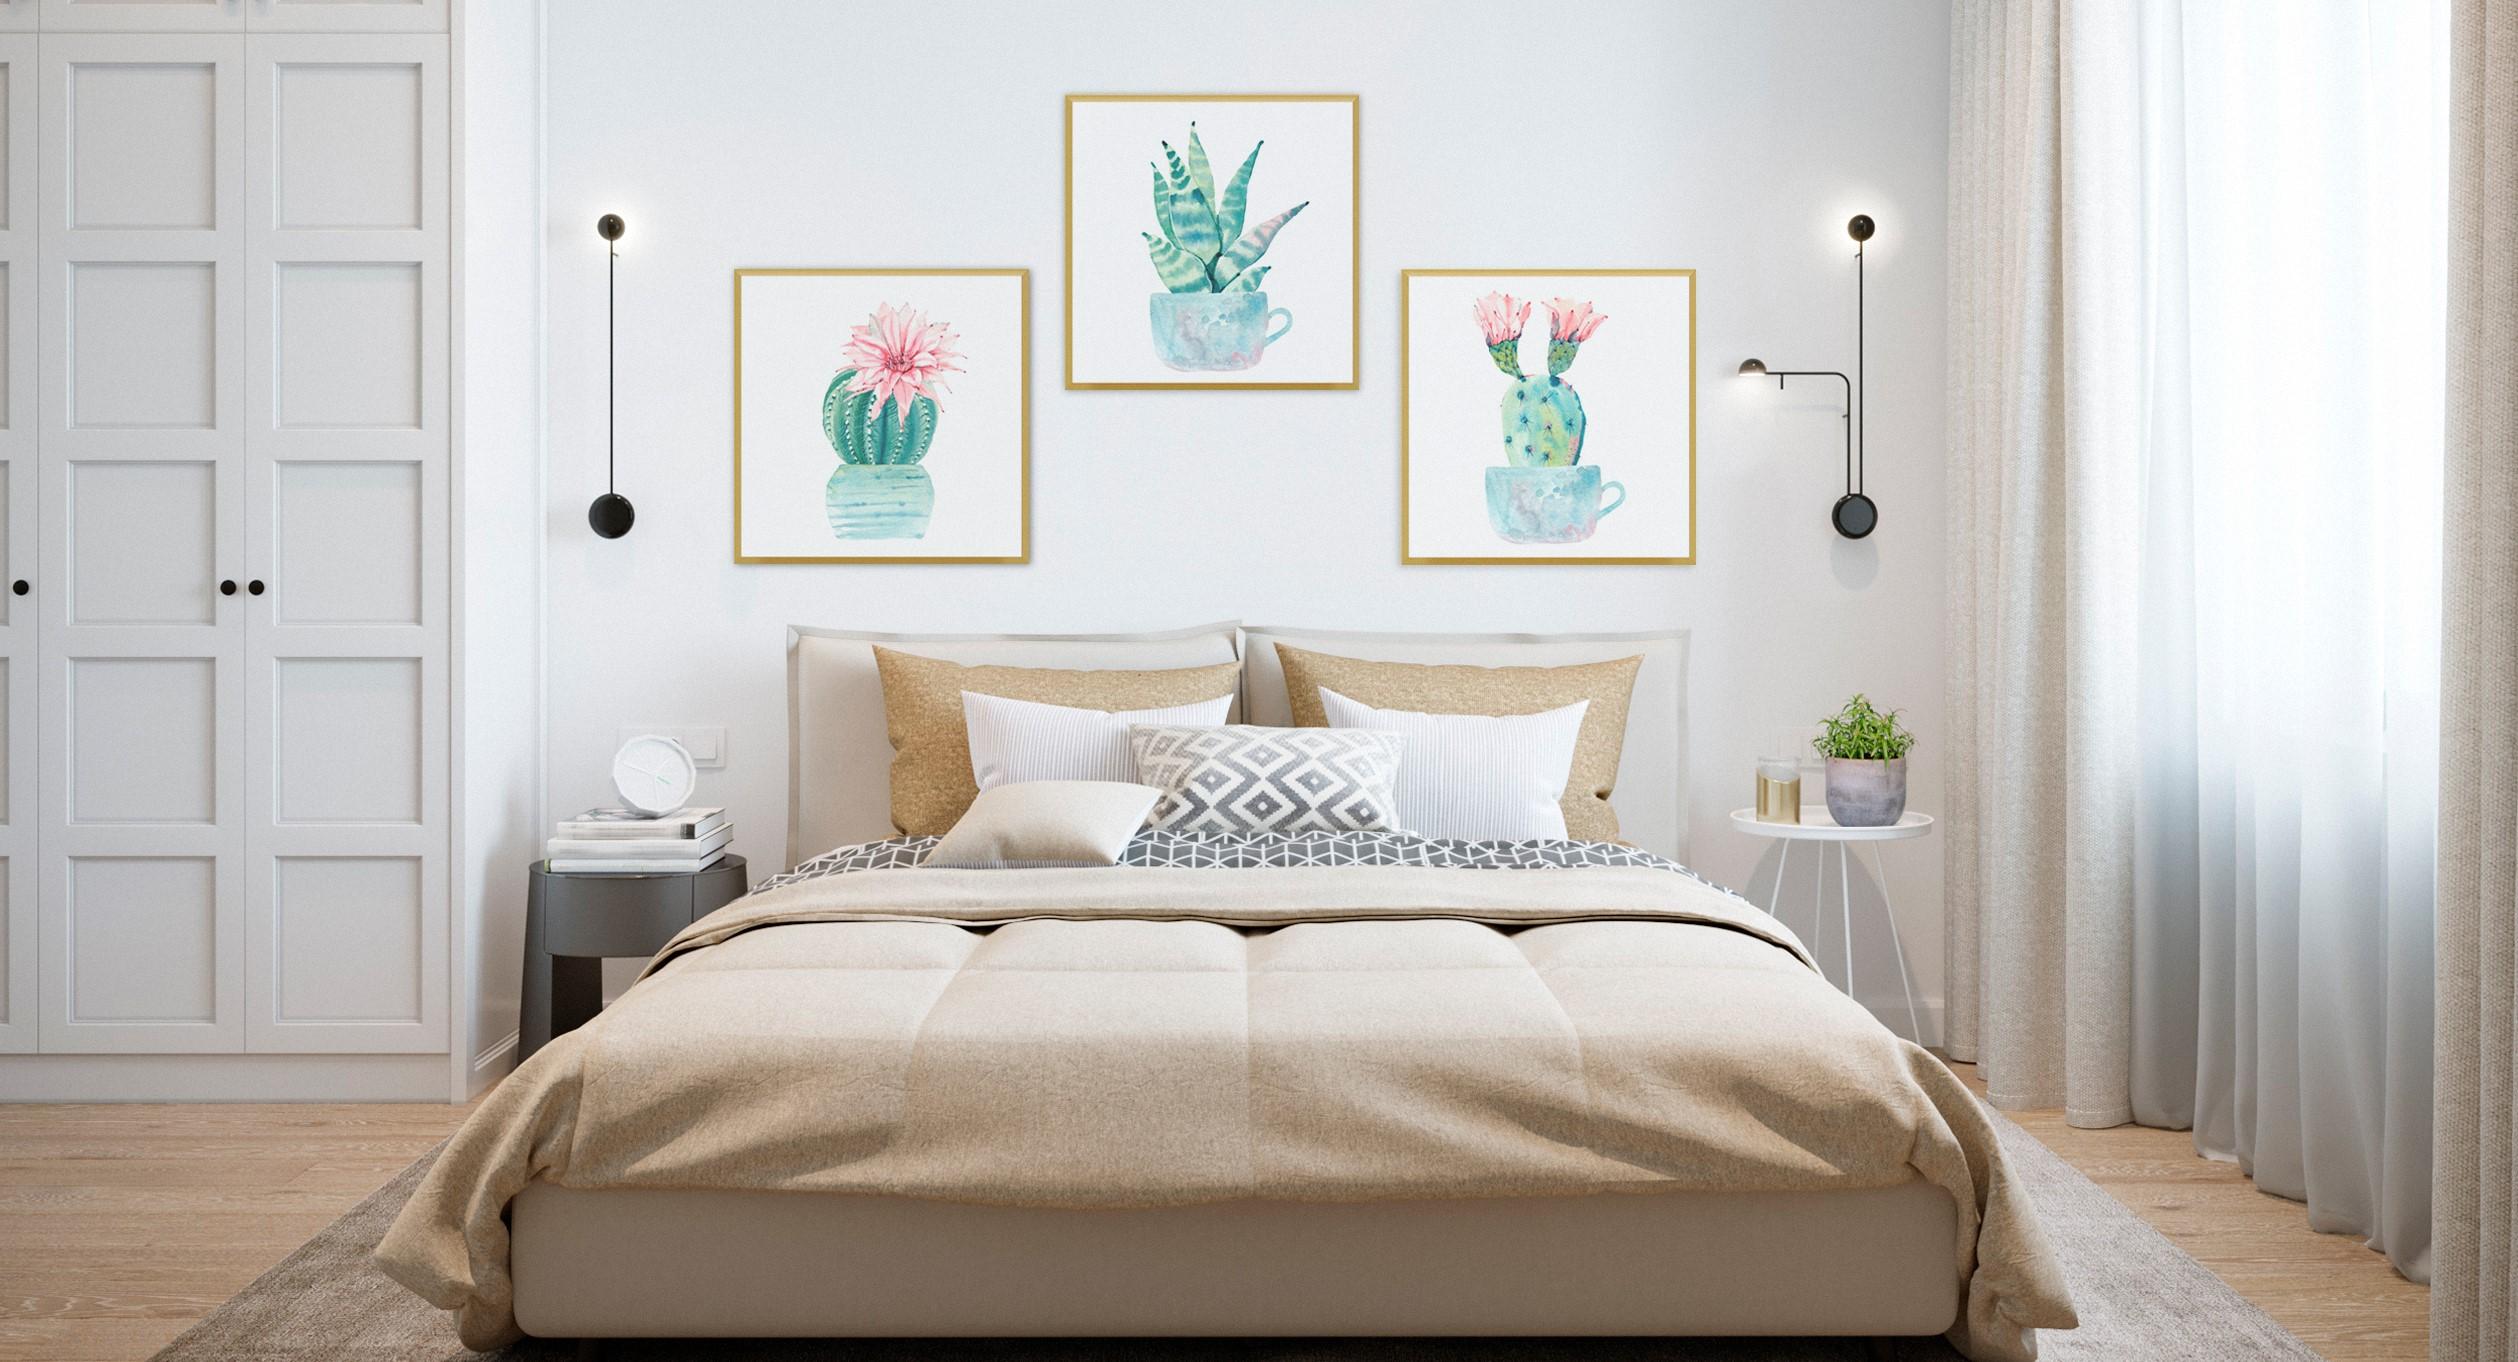 möblum-Consigue_una_recámara_acogedora-sábanas-frazada-ümbed-muebles(1)